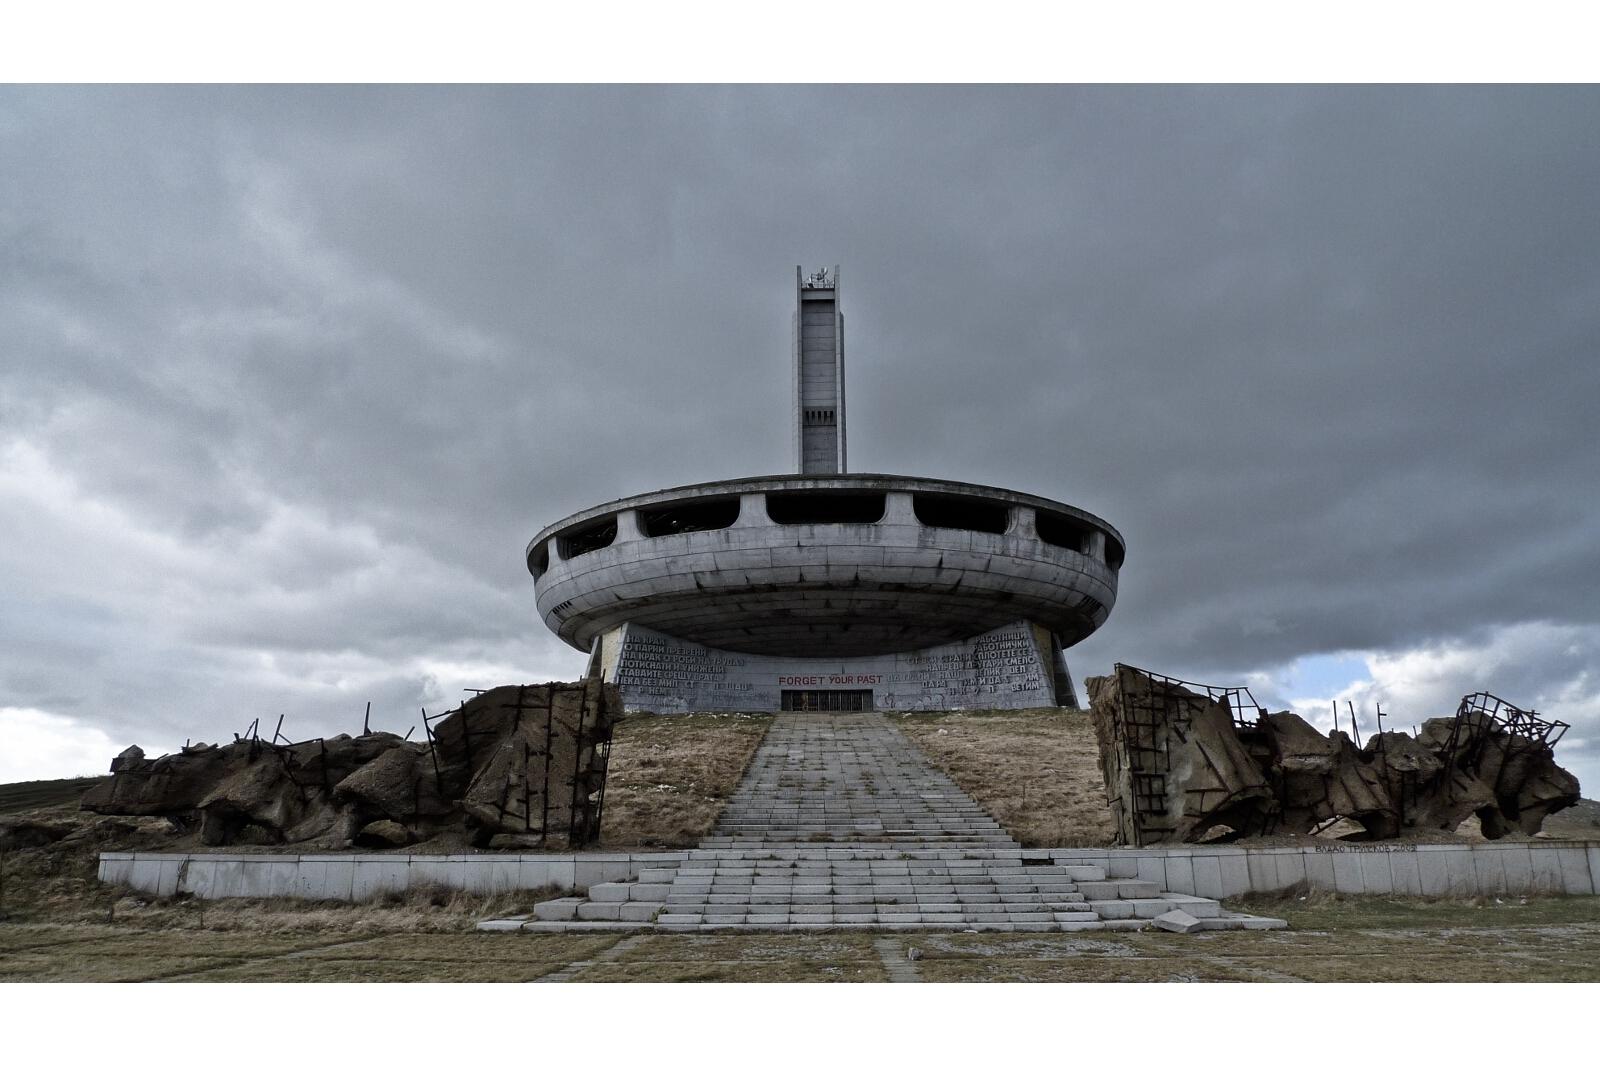 Memorial House of the Bulgarian Communist Party on mount Buzludzha